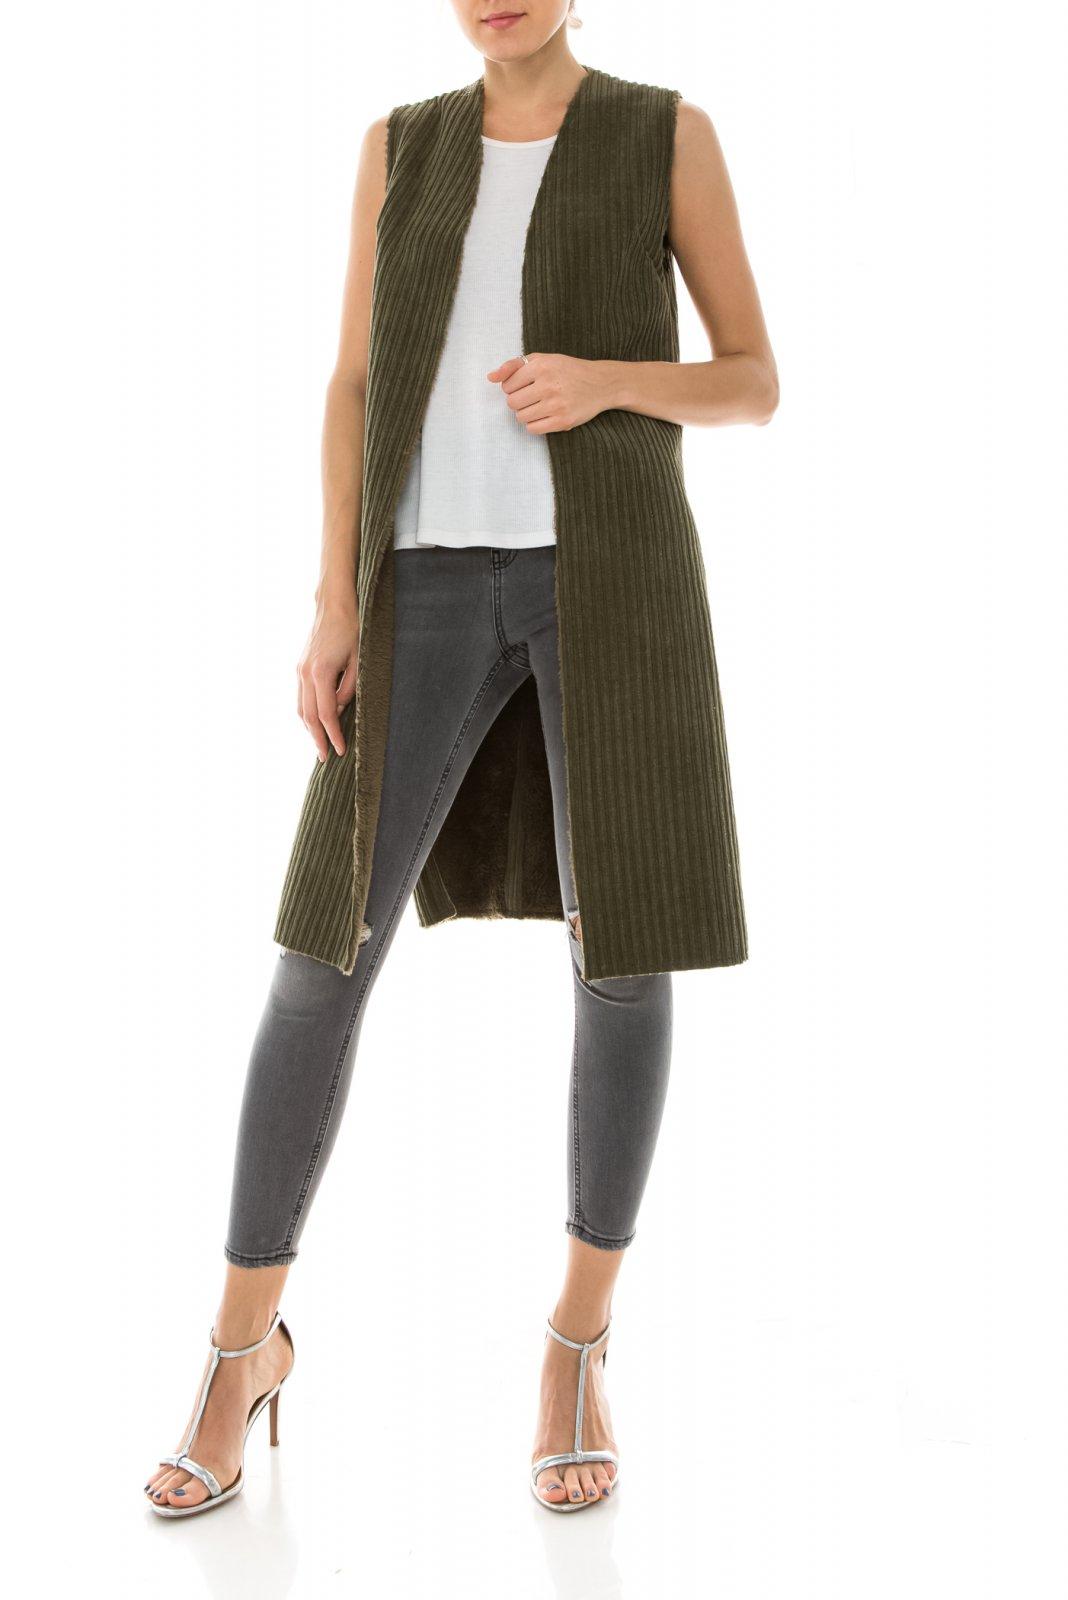 Jacket - Long Sherpa Vest OLIVE